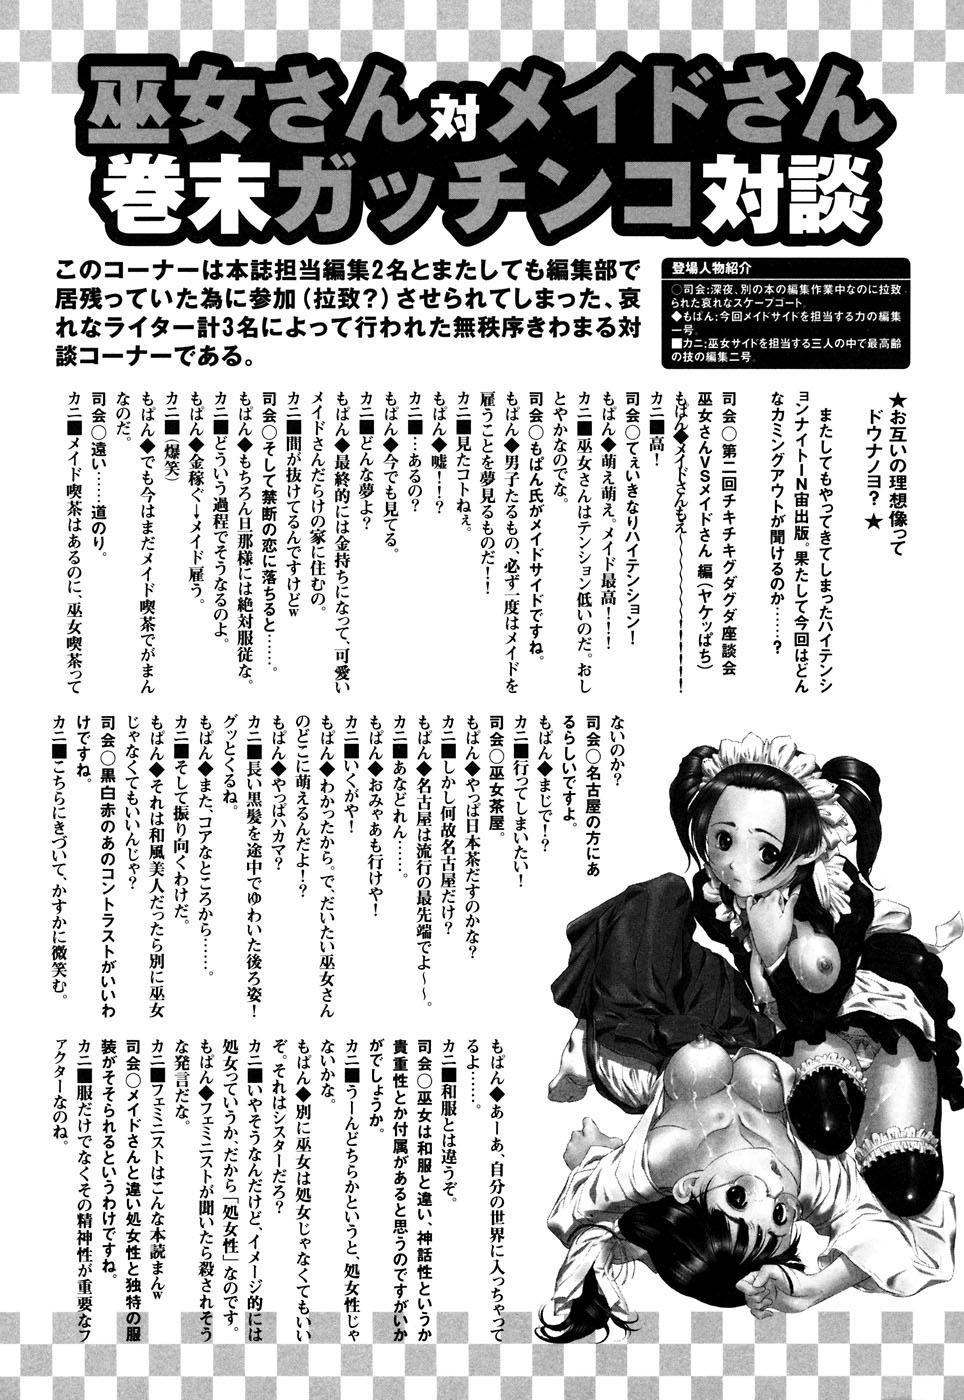 Fechikko VS Series ROUND.2 Miko San VS Maid San 163